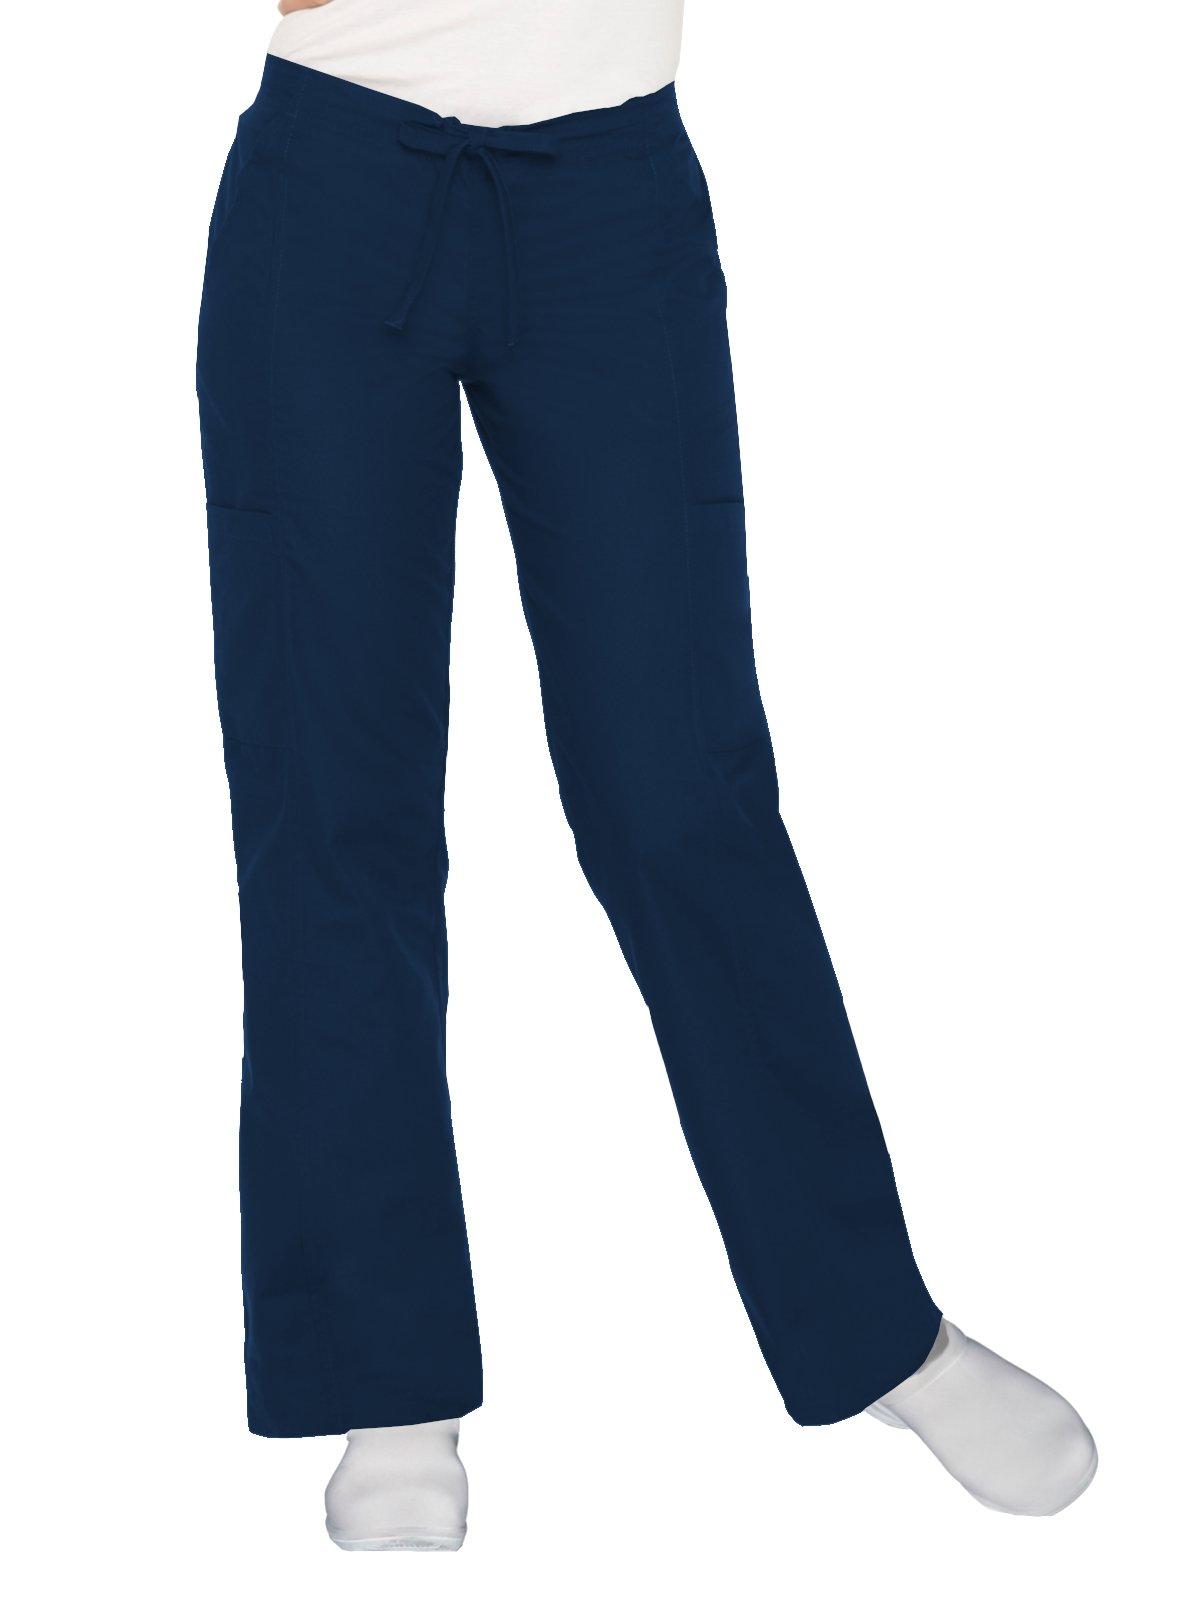 Landau Essentials Women's Classic Fit Dual-Pocket Cargo Scrub Pant Navy M